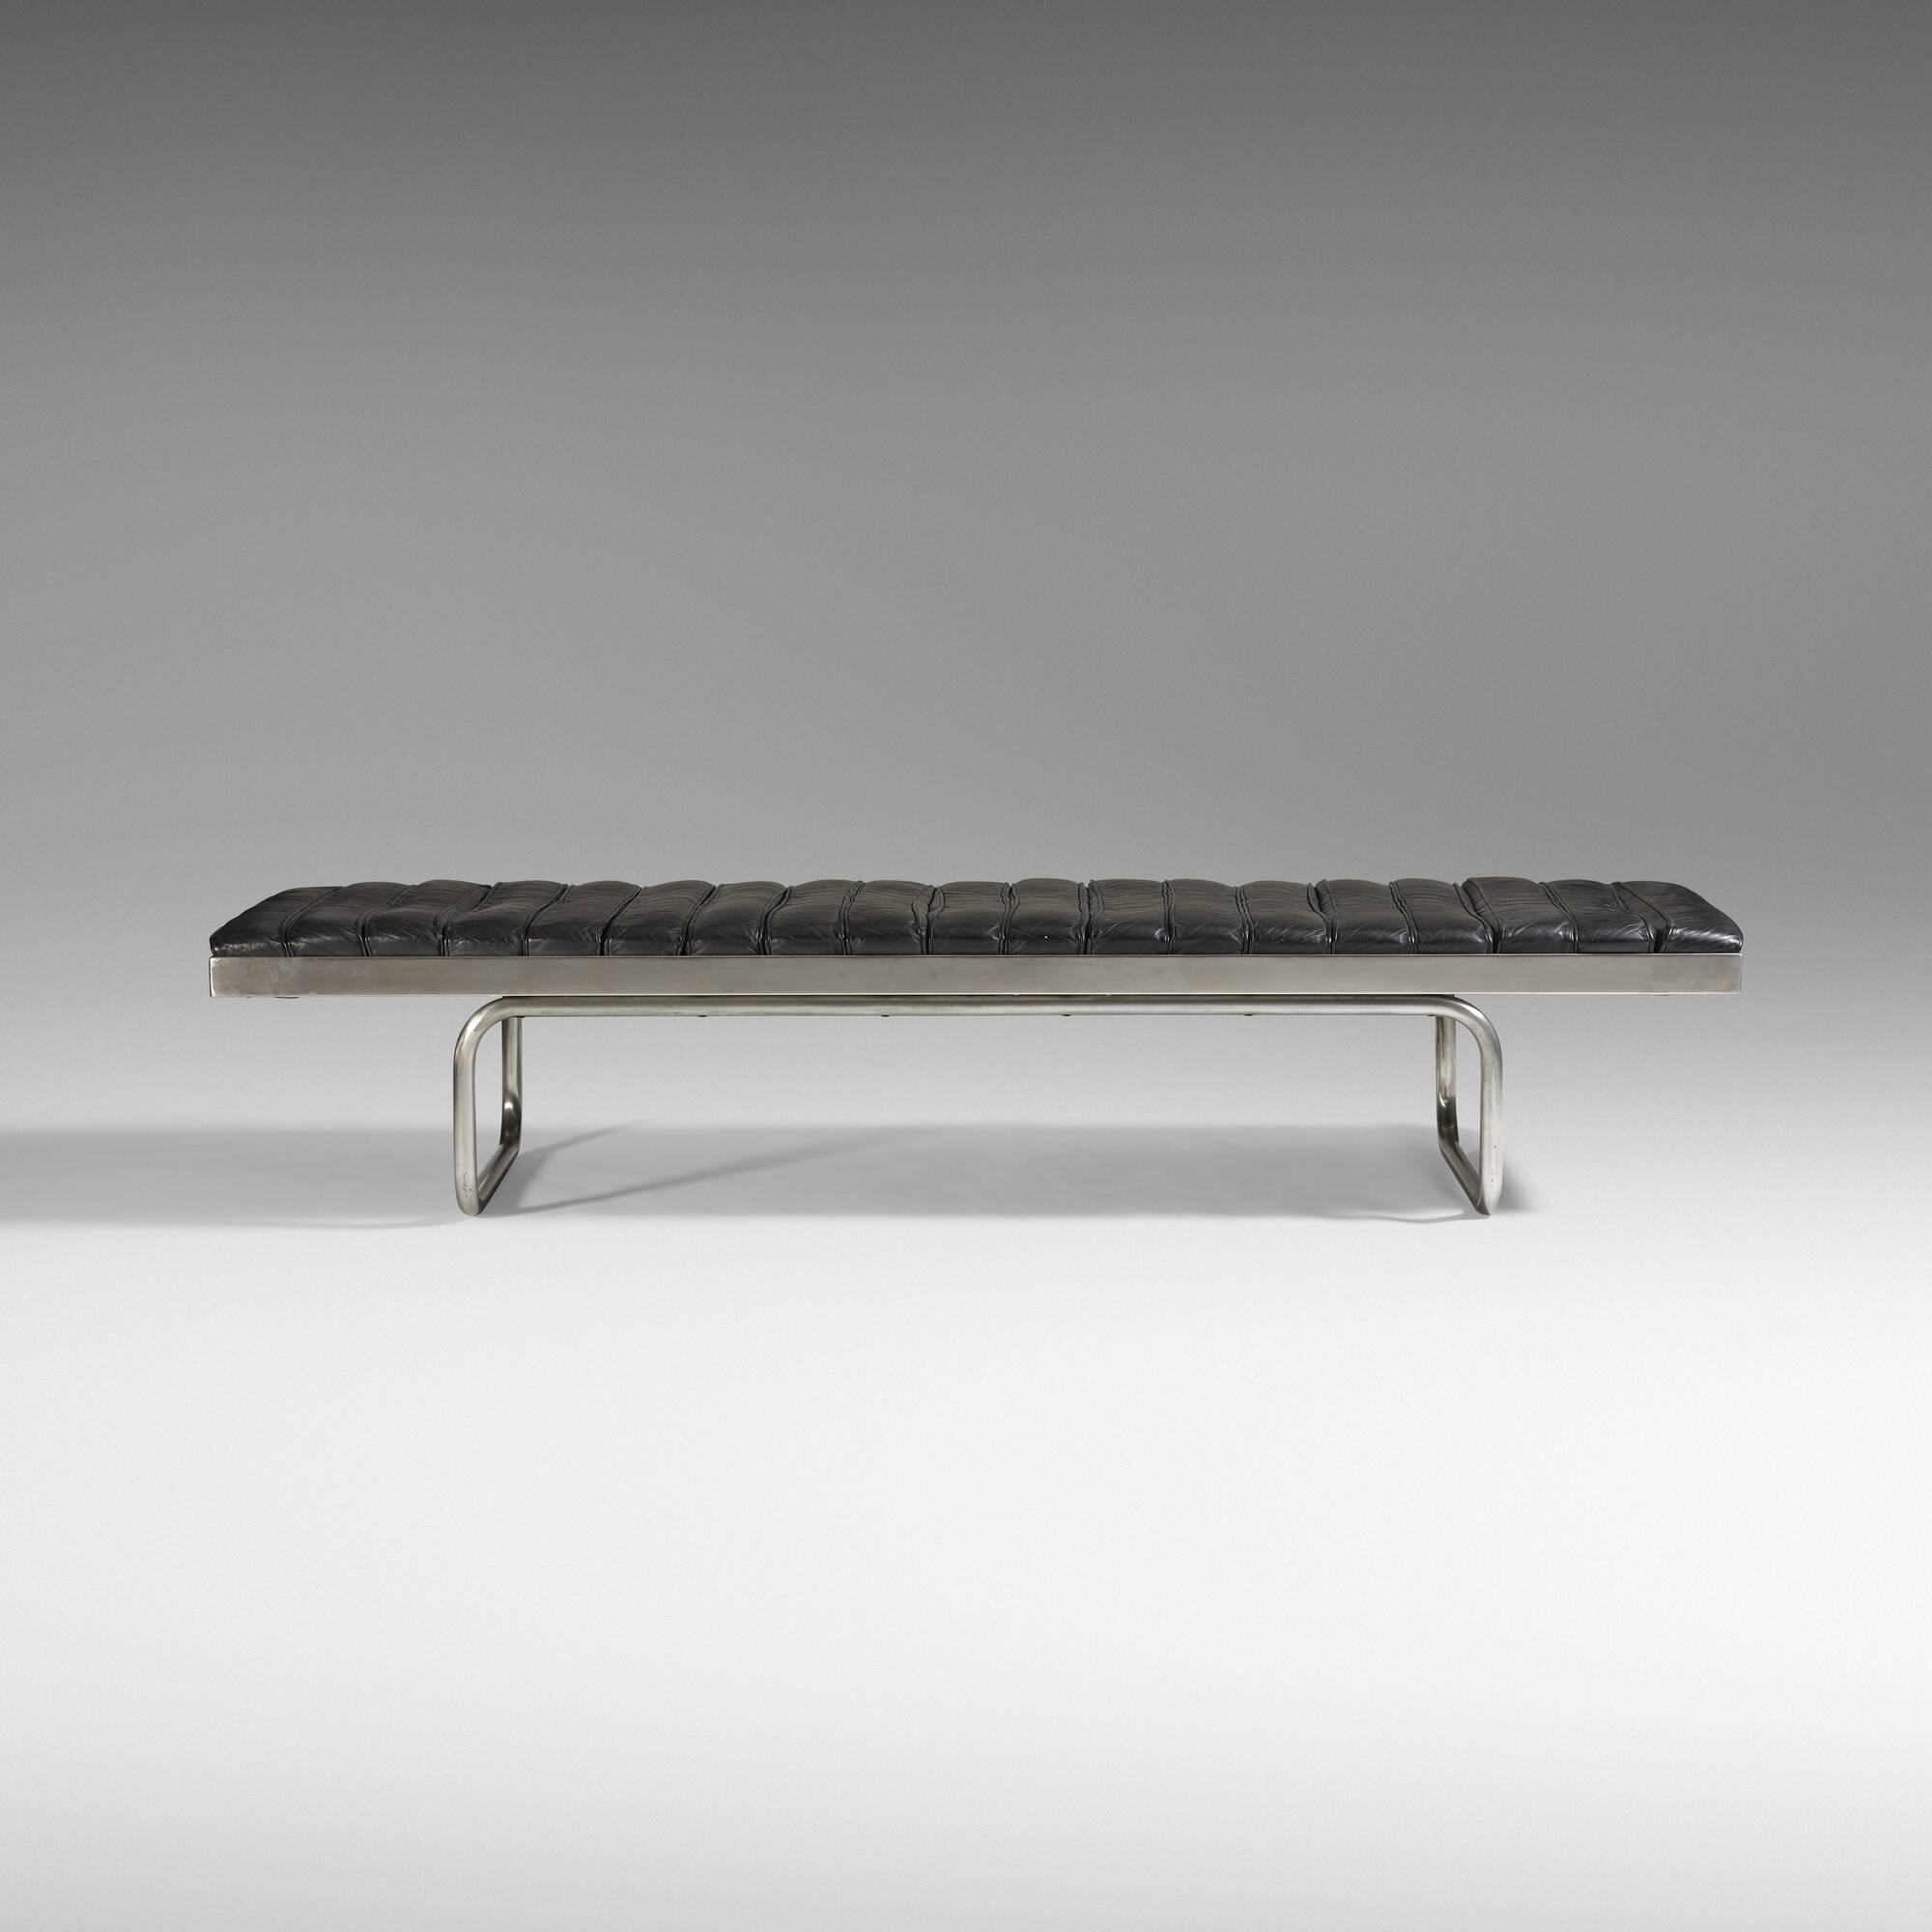 ameri green llc htm custom bench automotive benches